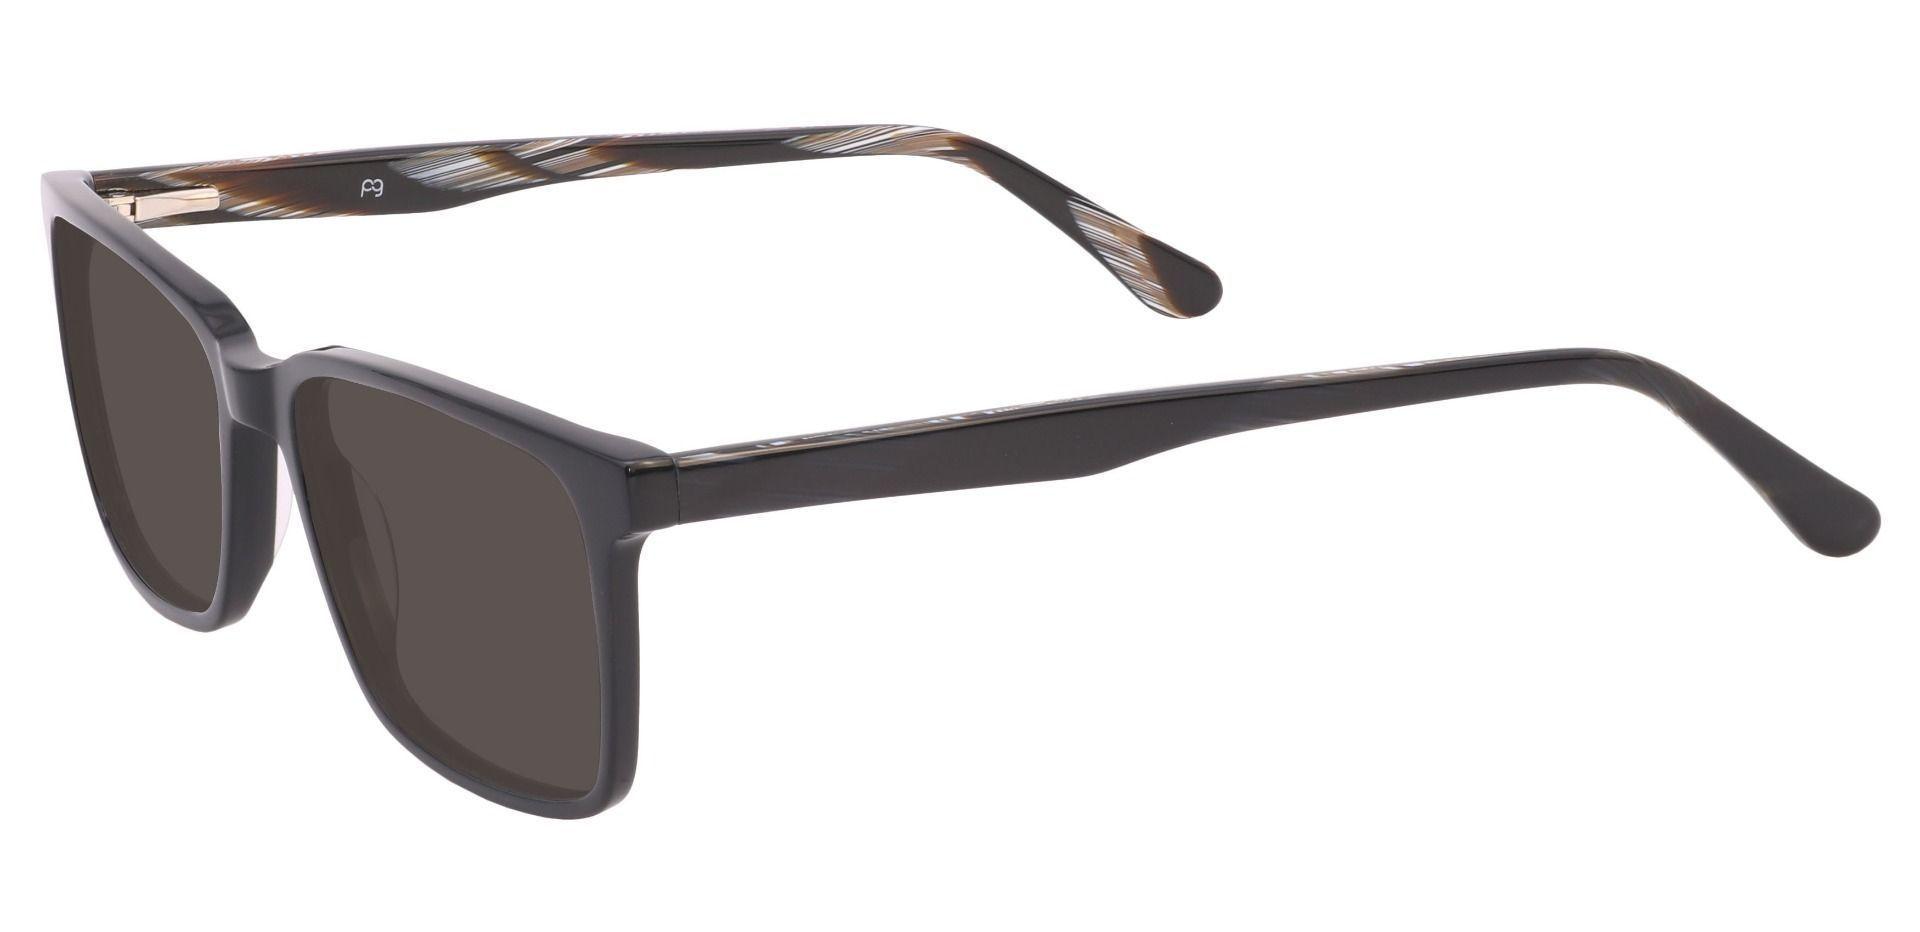 Venice Rectangle Prescription Sunglasses - Black Frame With Gray Lenses